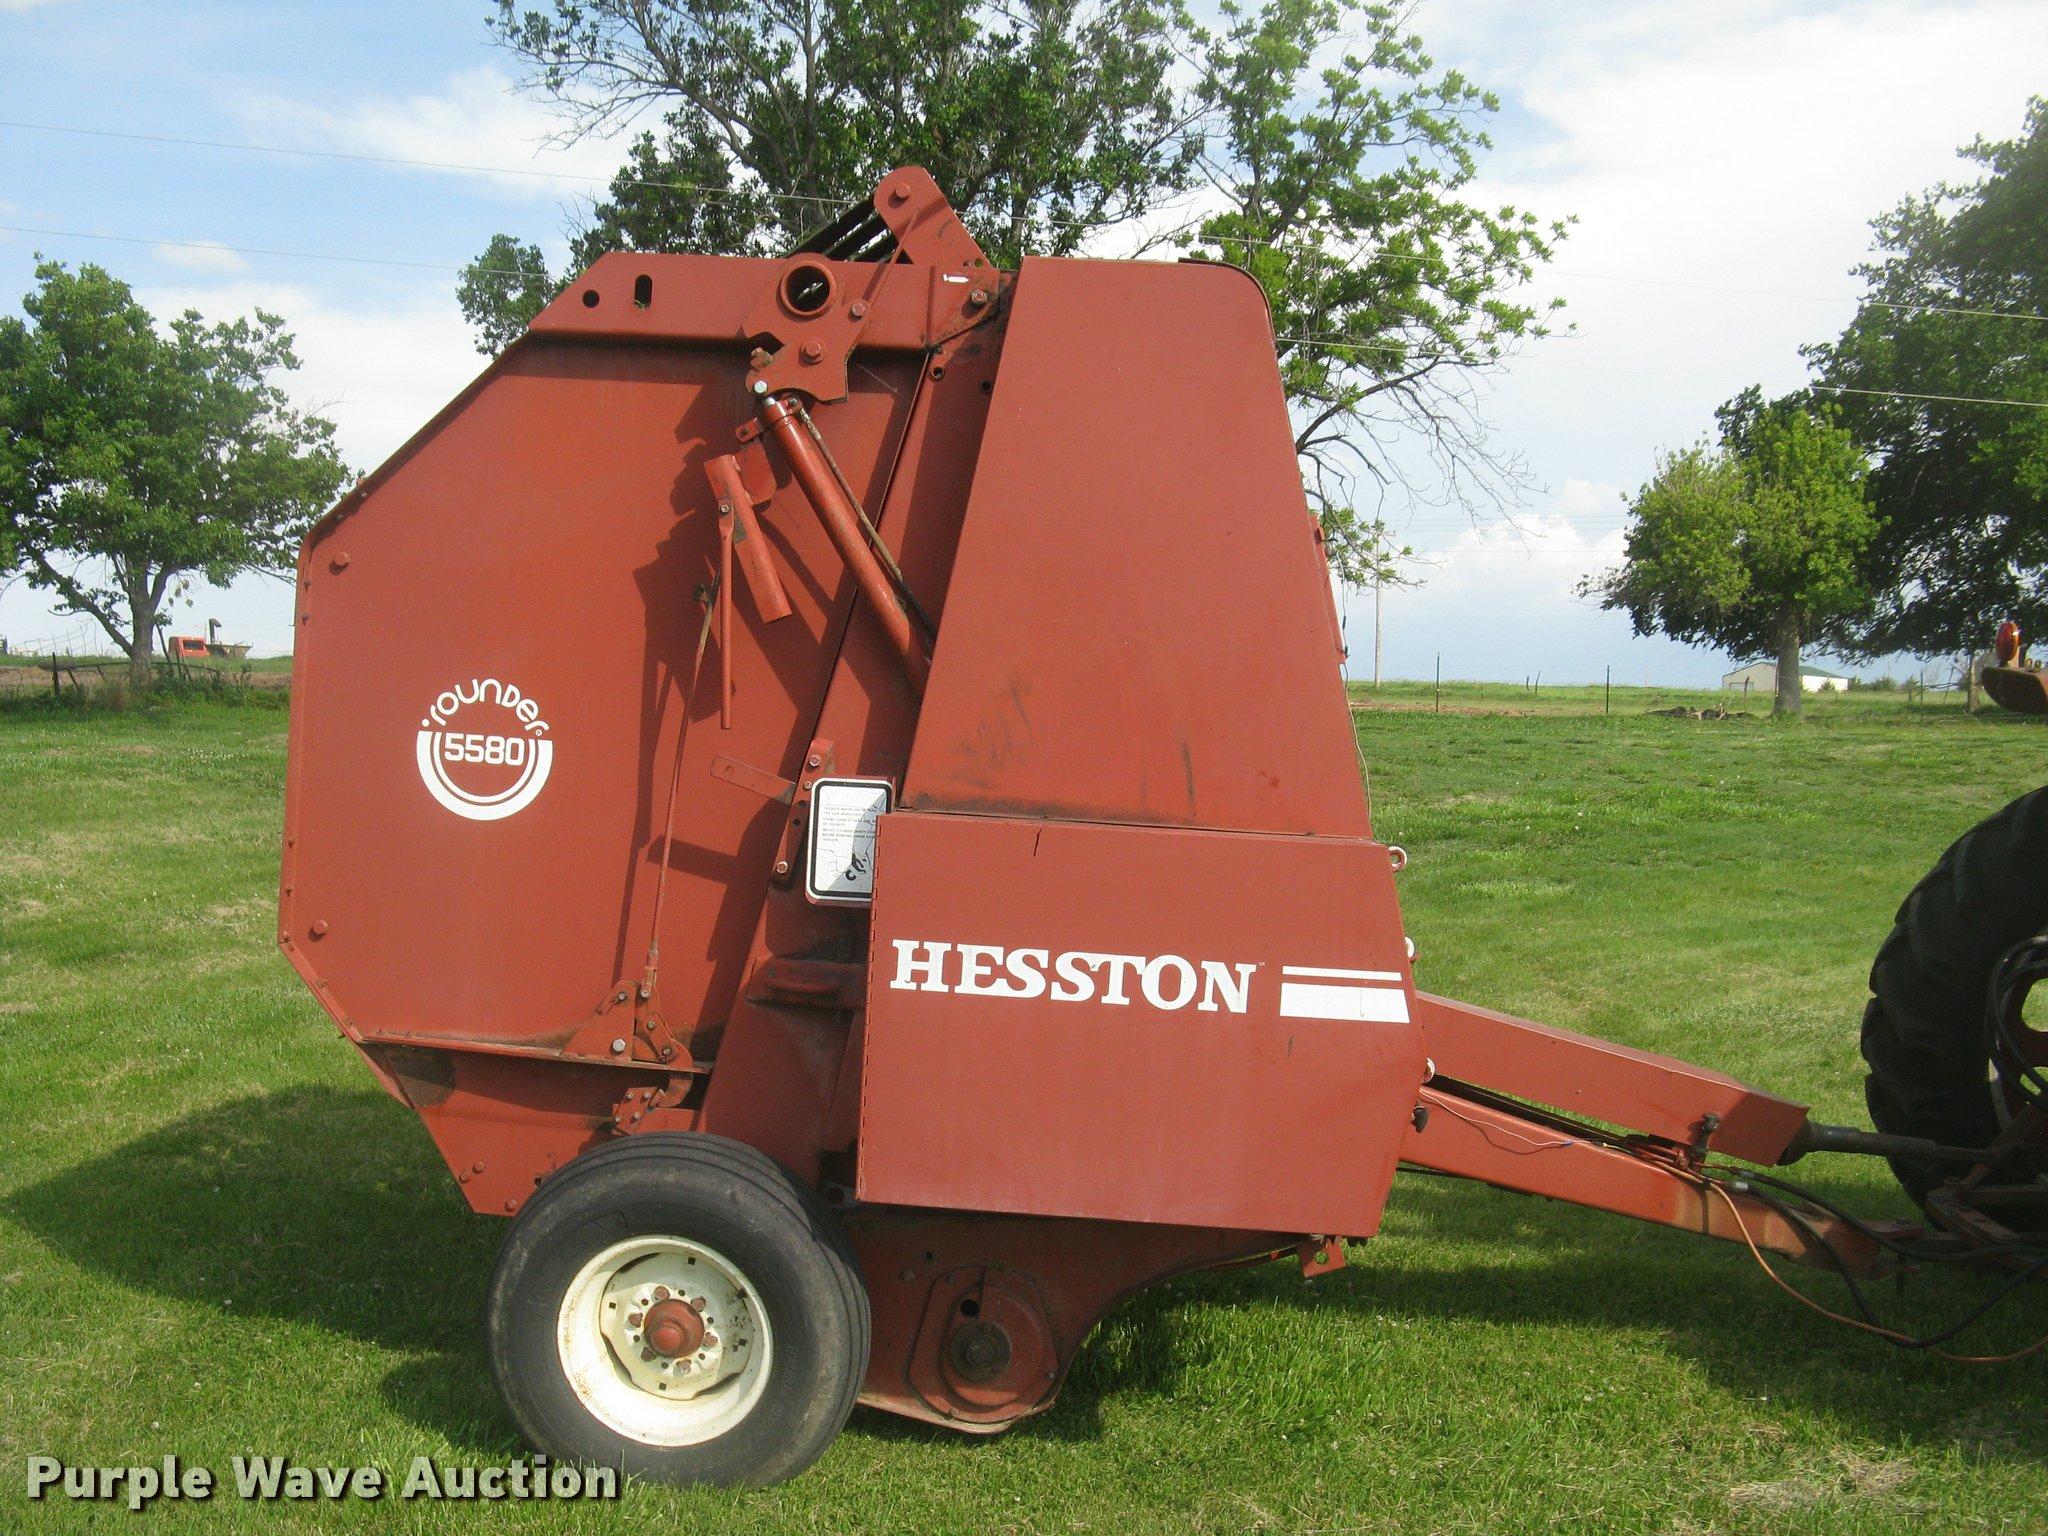 1983 Hesston 5580 round baler | Item L2331 | SOLD! June 14 A